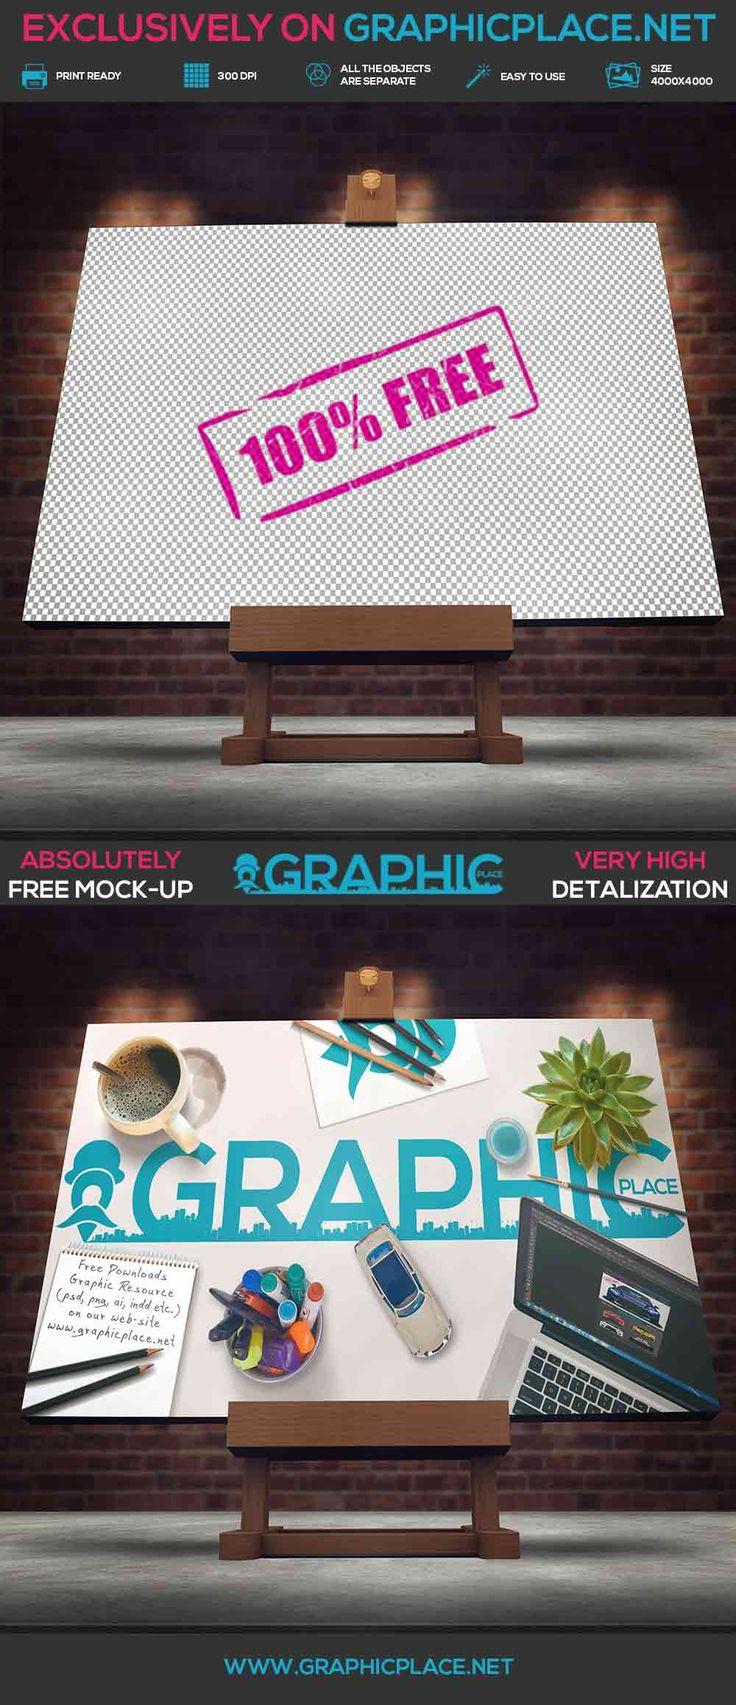 Studio Easel - Free PSD Mockup.  #art #picture #studioeasel #freeMockUp #freepsd #freepng #psd #mockup #studioeaselmockup  DOWNLOAD FREE MOCKUP HERE: http://www.graphicplace.net/studio-easel-free-psd-mockup/  MORE FREE GRAPHIC RESOURCES: http://www.graphicplace.net/